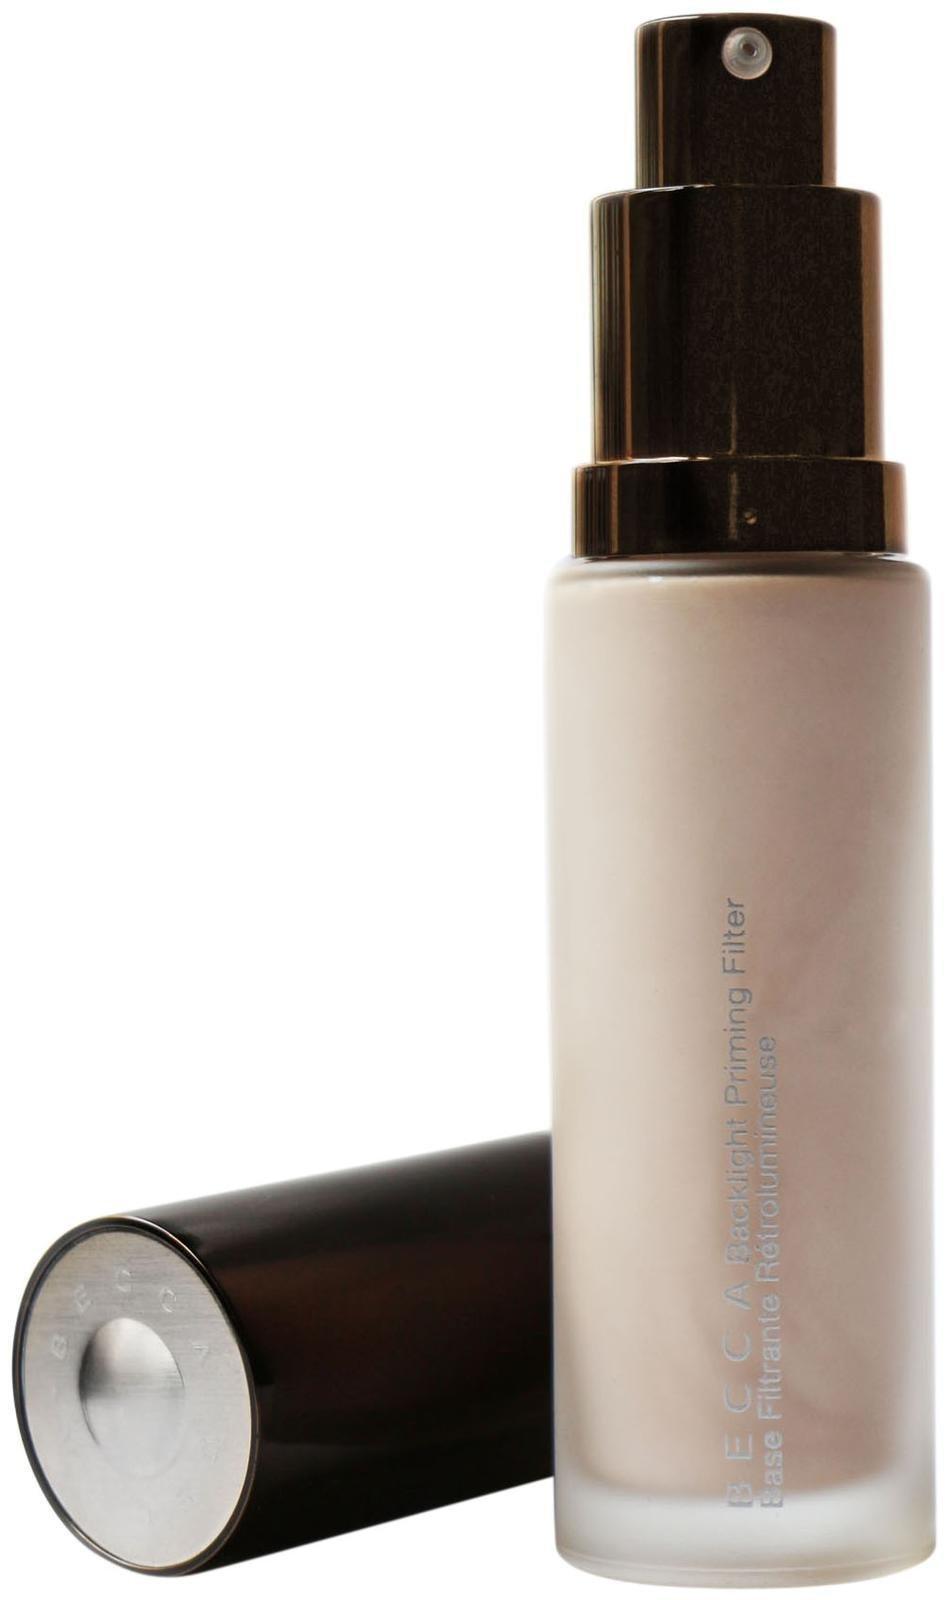 BECCA Cosmetics - Backlight Priming Filter 30mL/1Fl.oz by BECCA